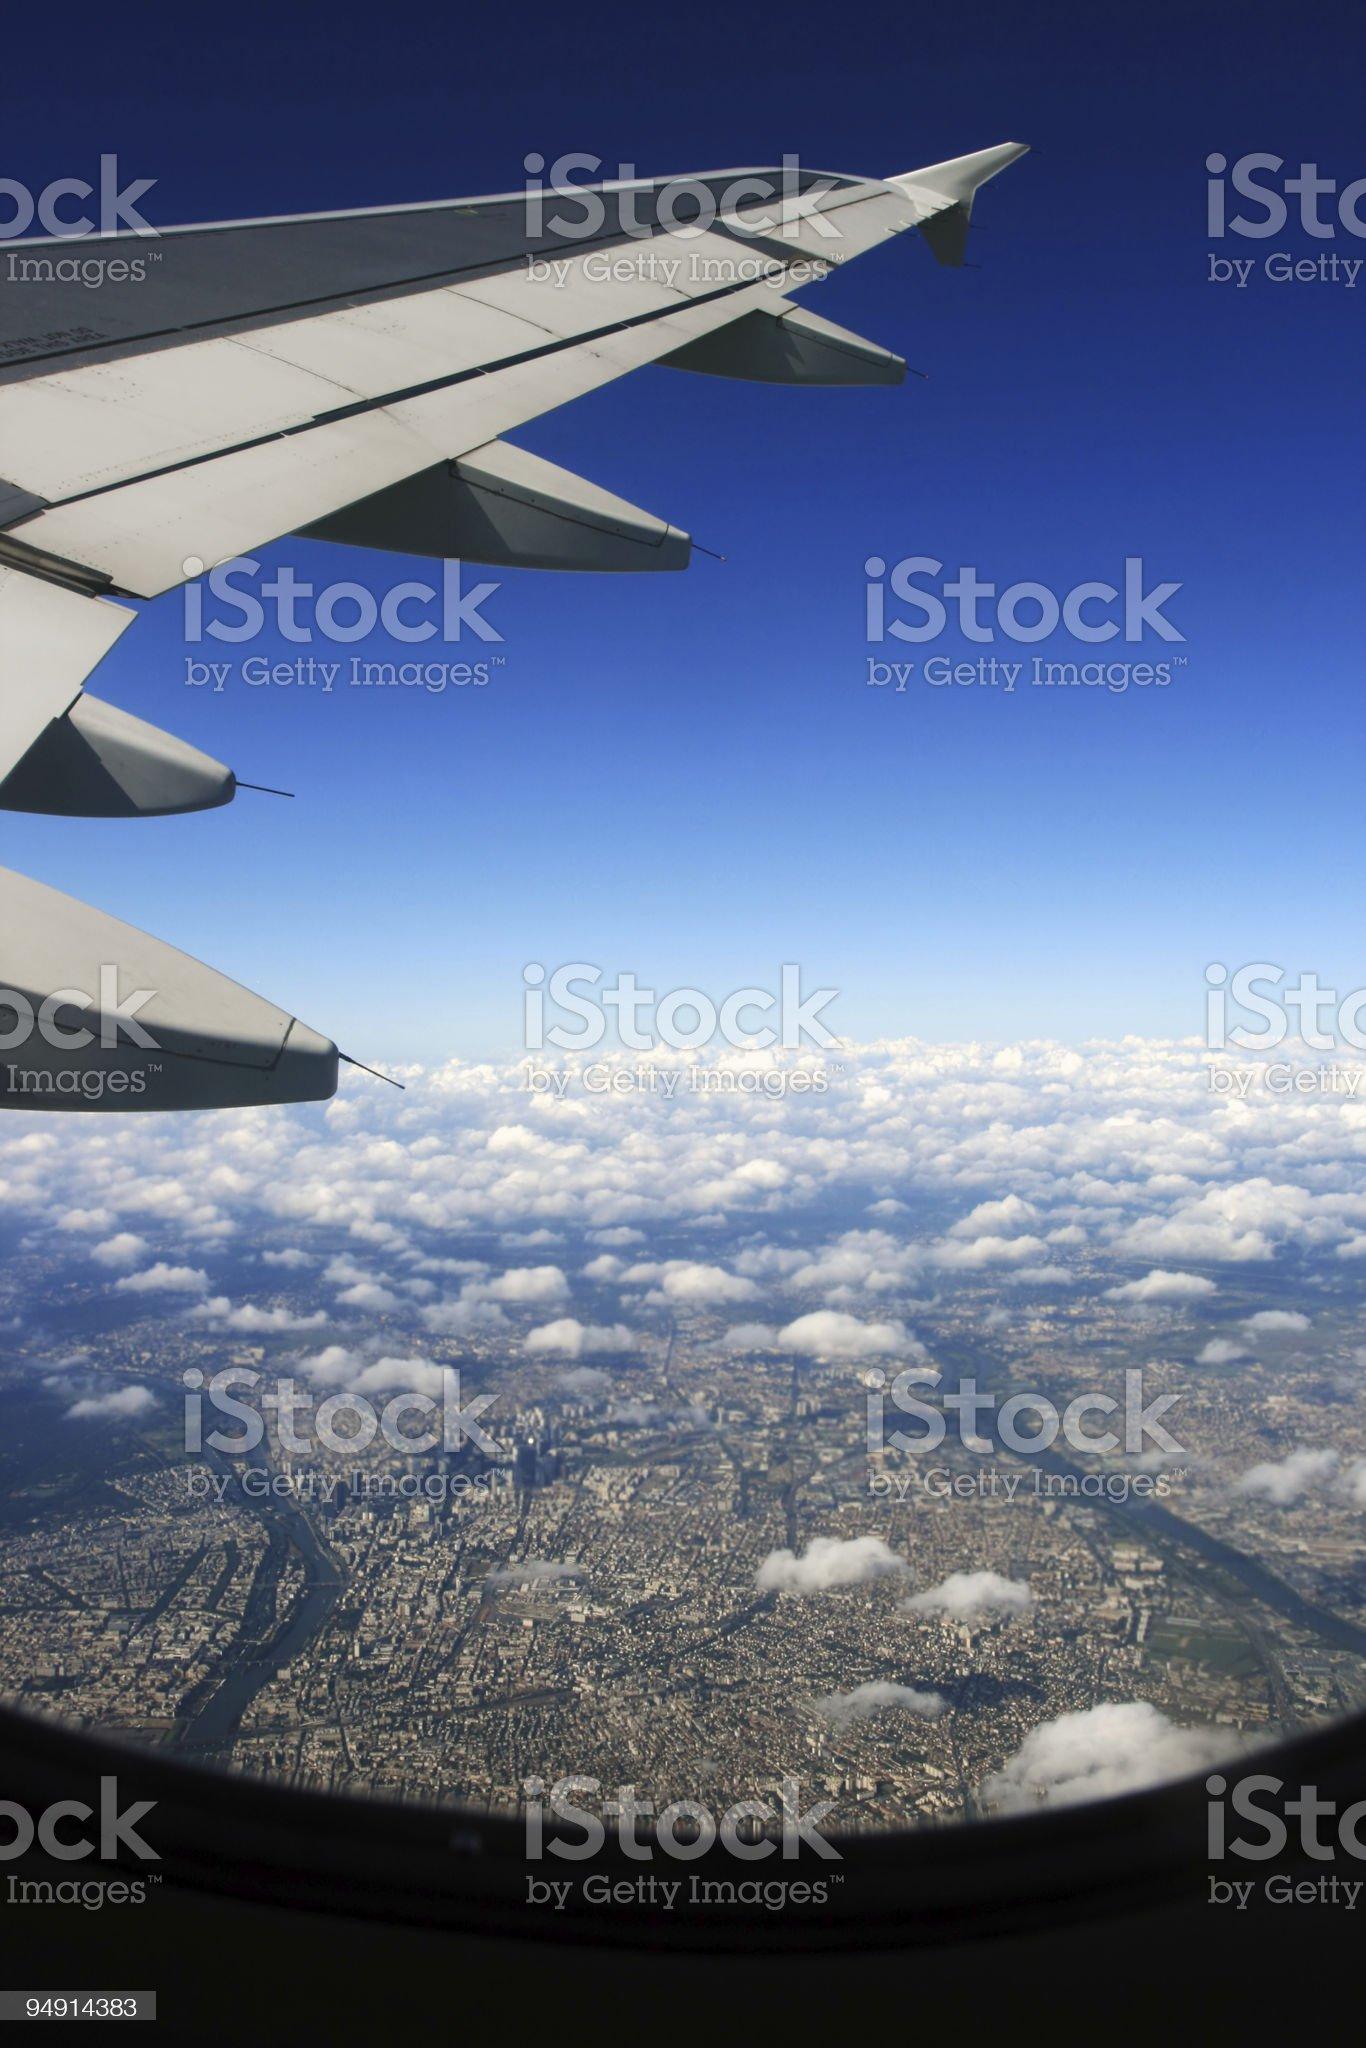 Airplane View royalty-free stock photo